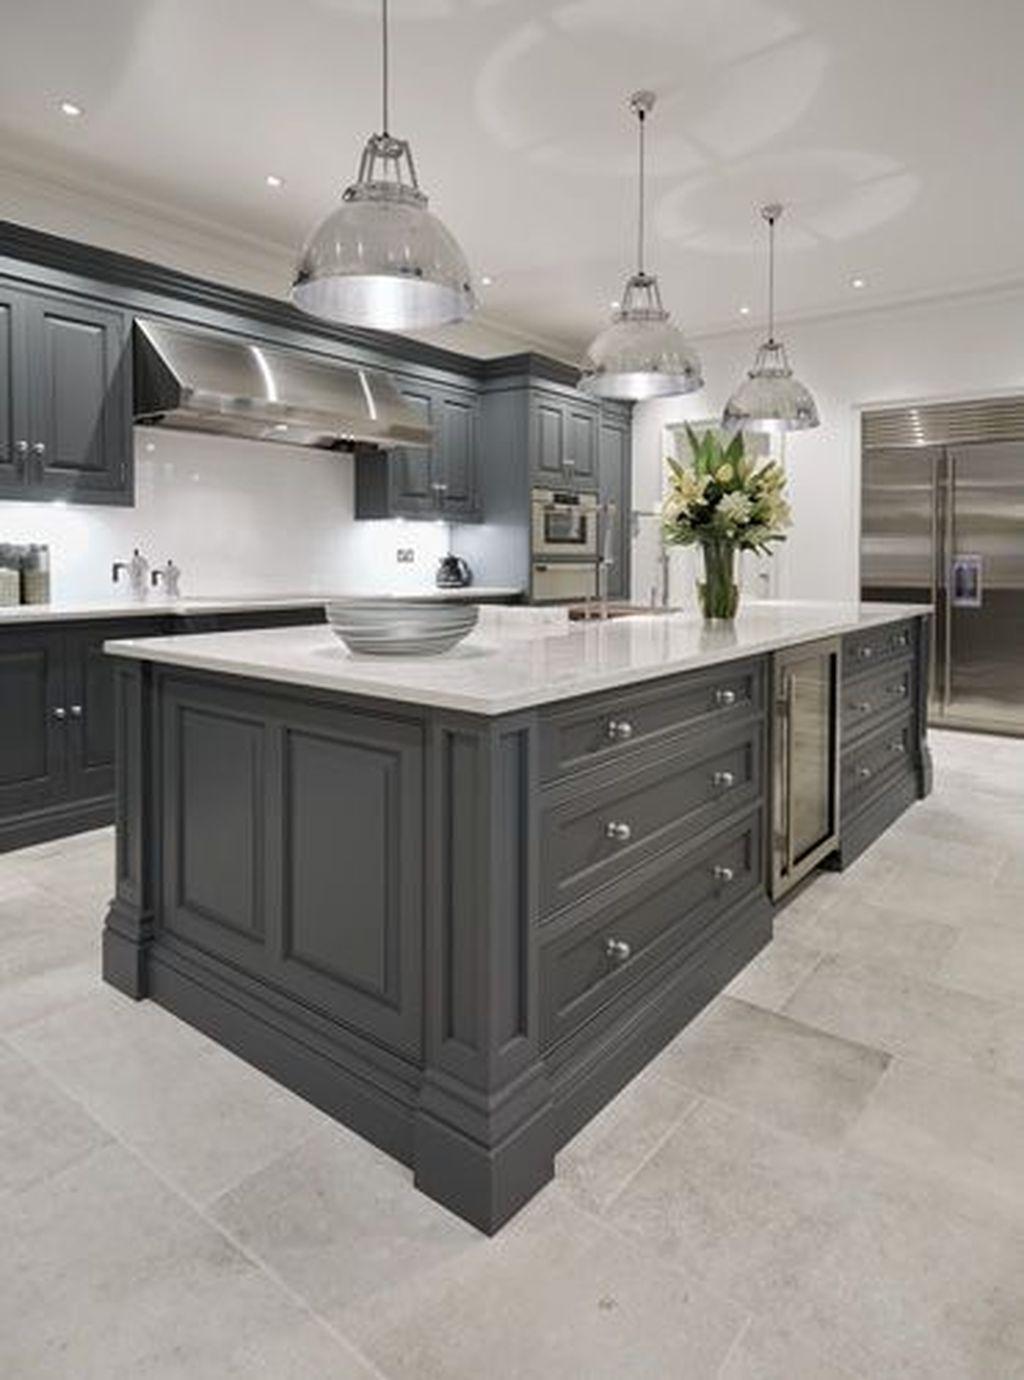 35 Elegant Kitchen Design Inspiration Cedrica News Grey Kitchen Designs Elegant Kitchen Design Kitchen Cabinet Design